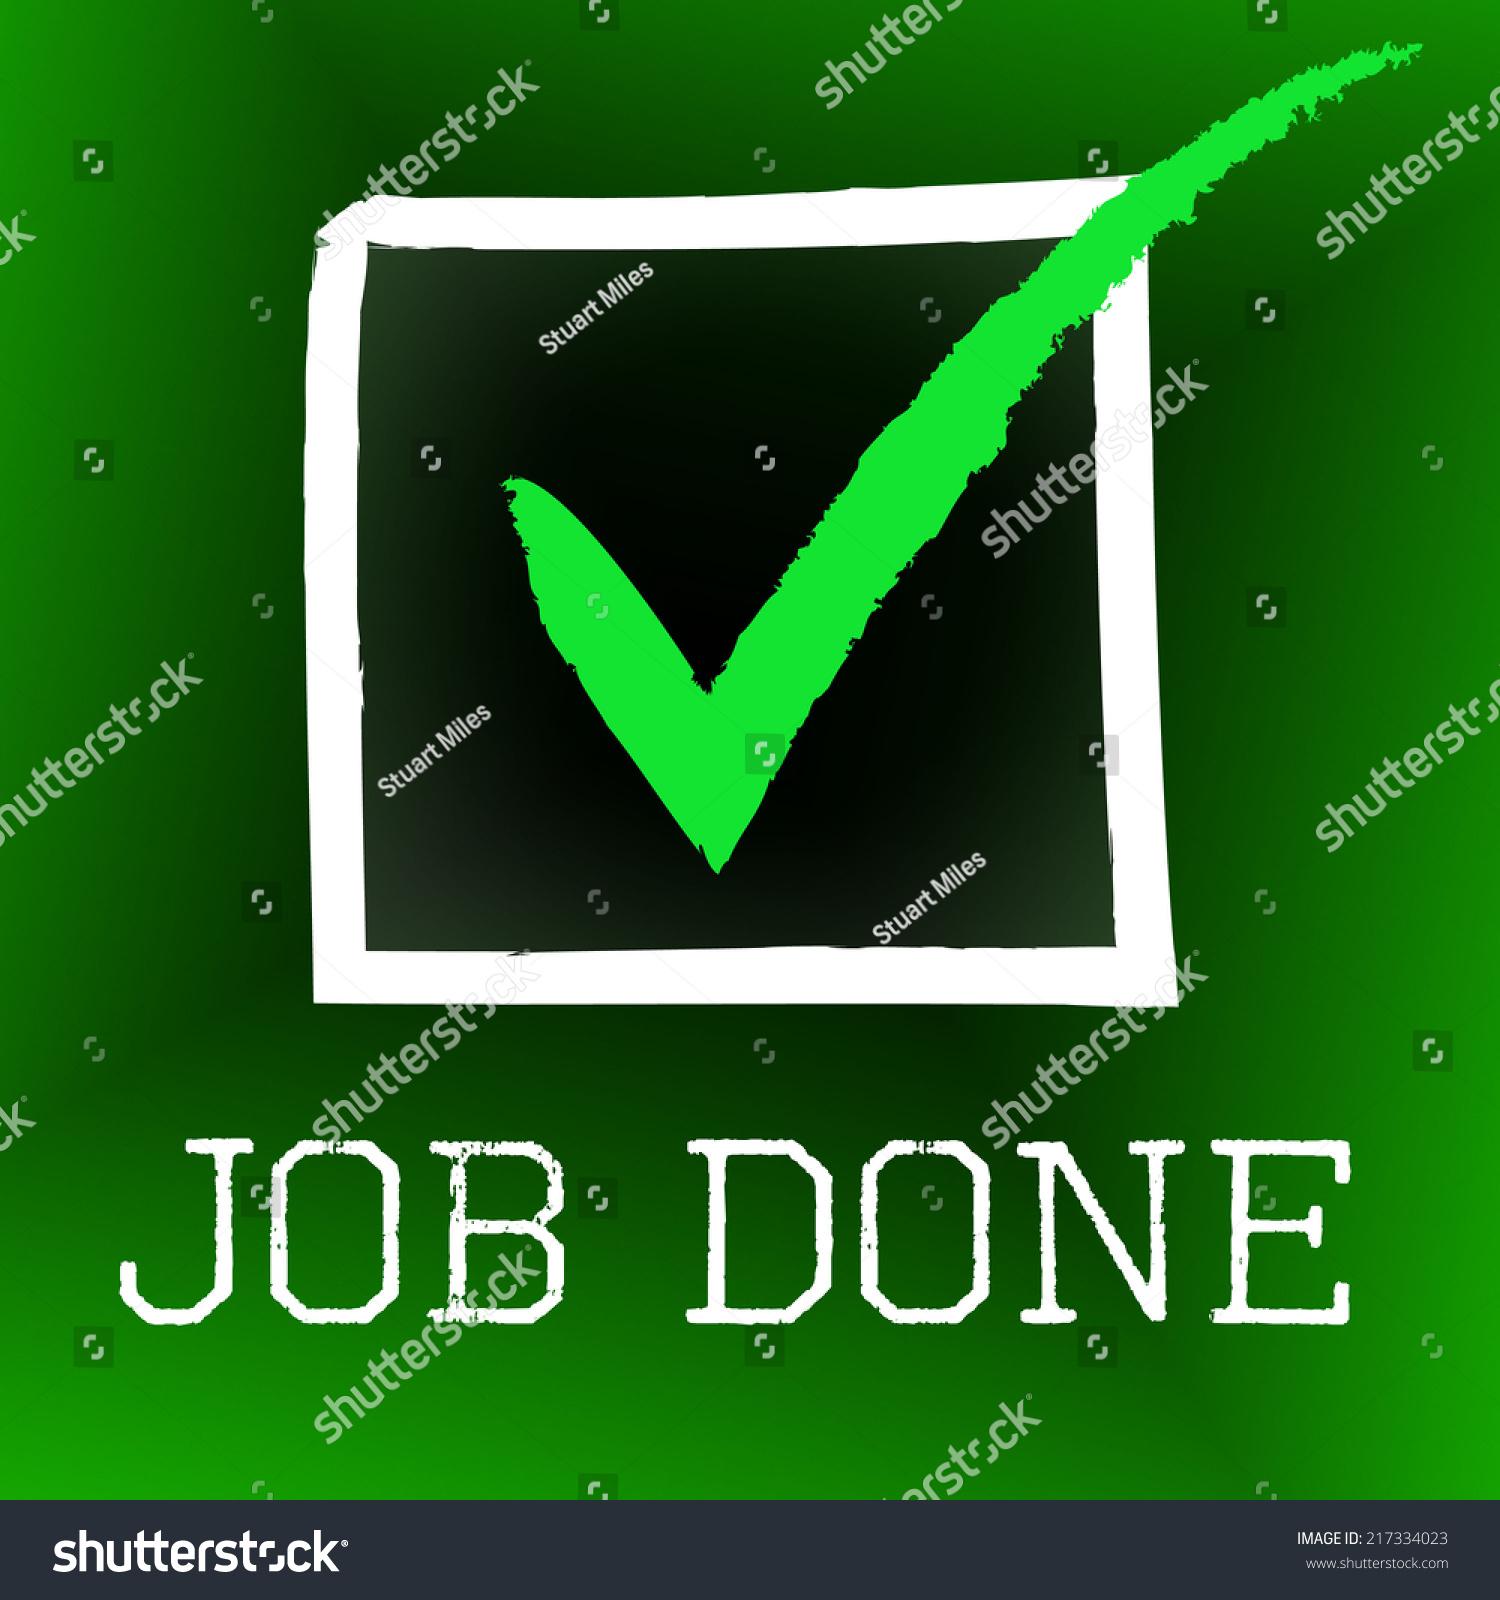 Checkmark symbol in word choice image symbol and sign ideas job done showing tick symbol ok stock illustration 217334023 job done showing tick symbol and ok buycottarizona